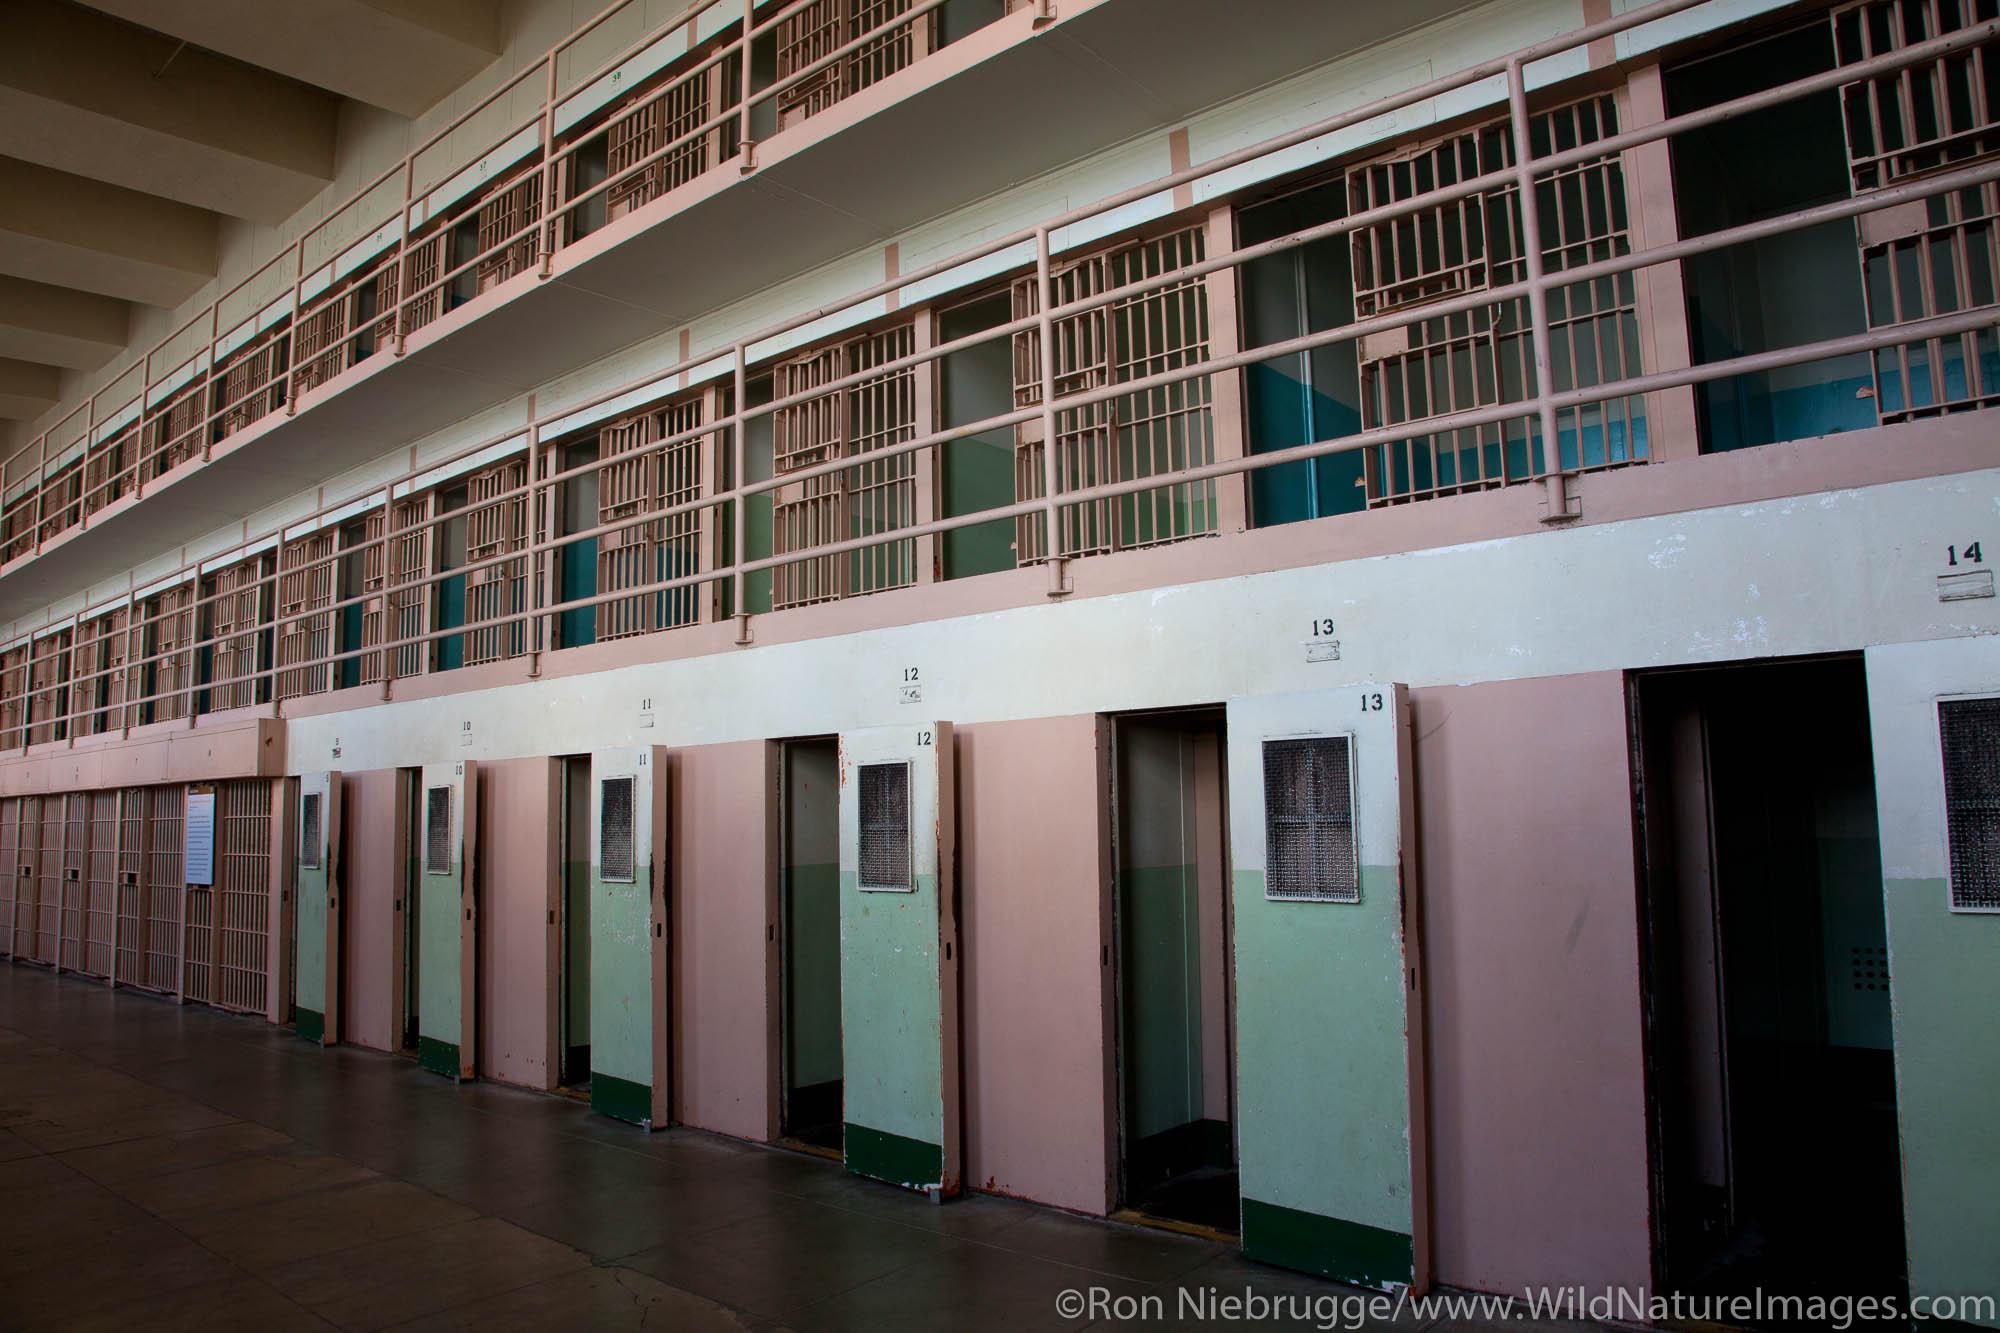 Inside cellhouse at Alcatraz, D Block, San Francisco, CA